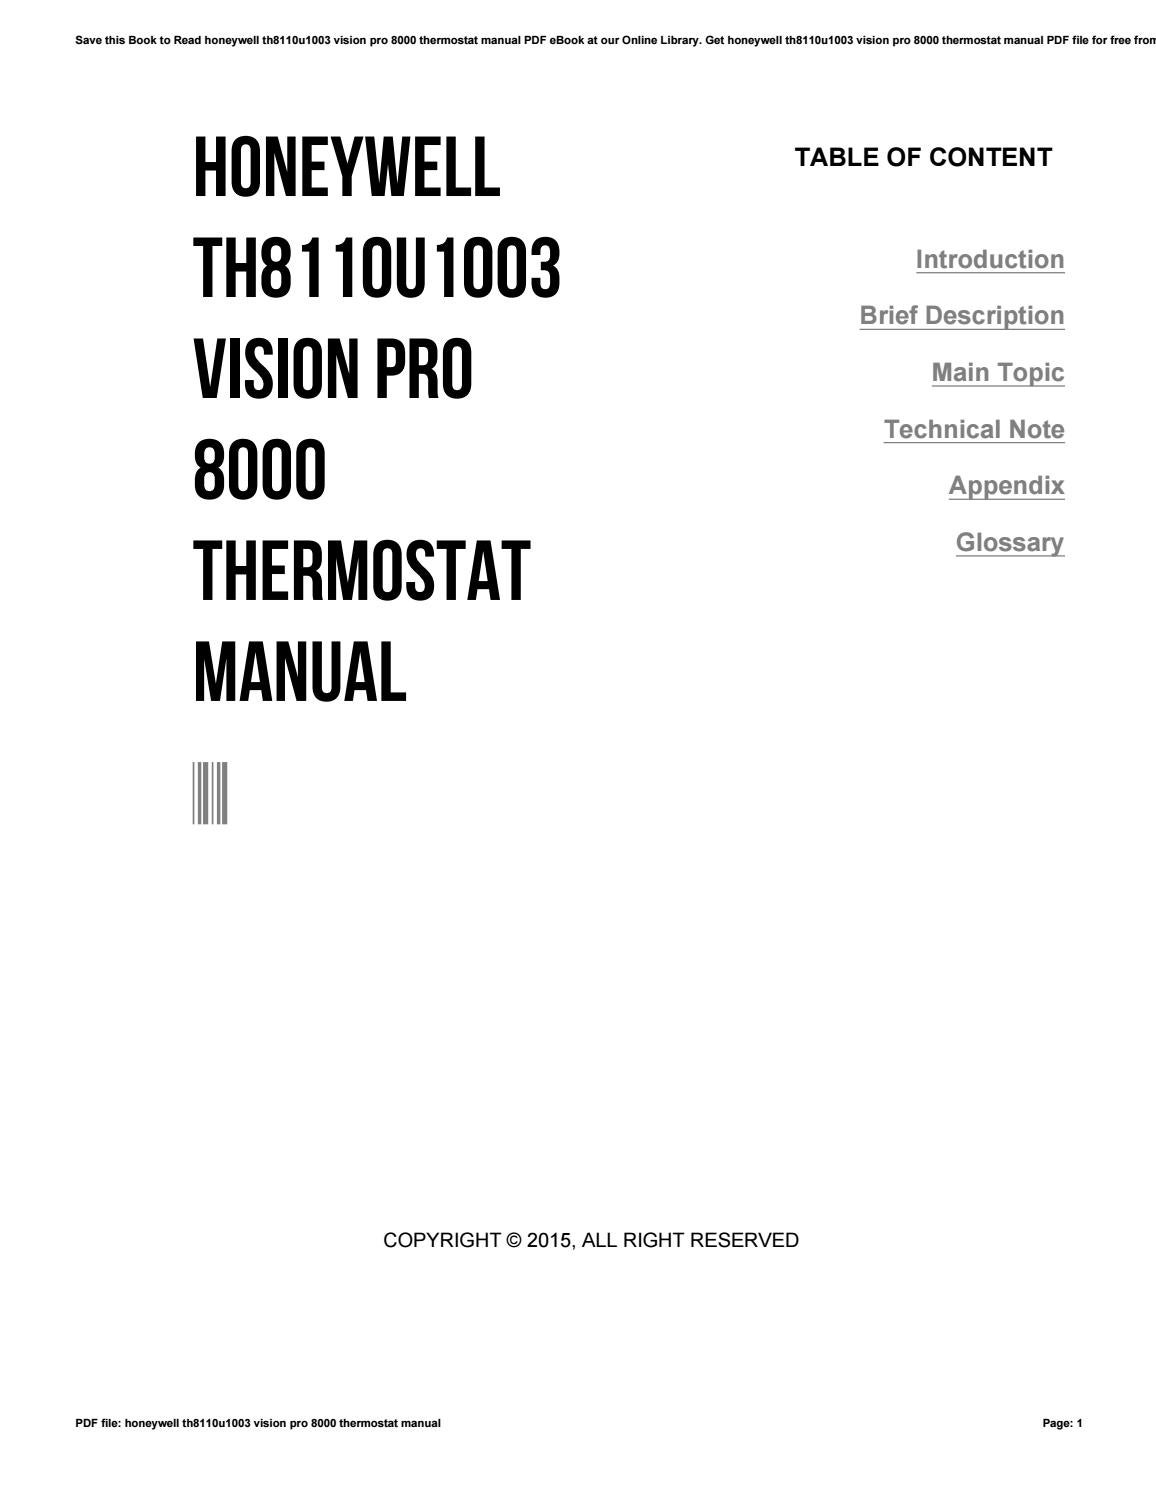 Honeywell th8110u1003 vision pro 8000 thermostat manual by e-mailbox6 -  issuu